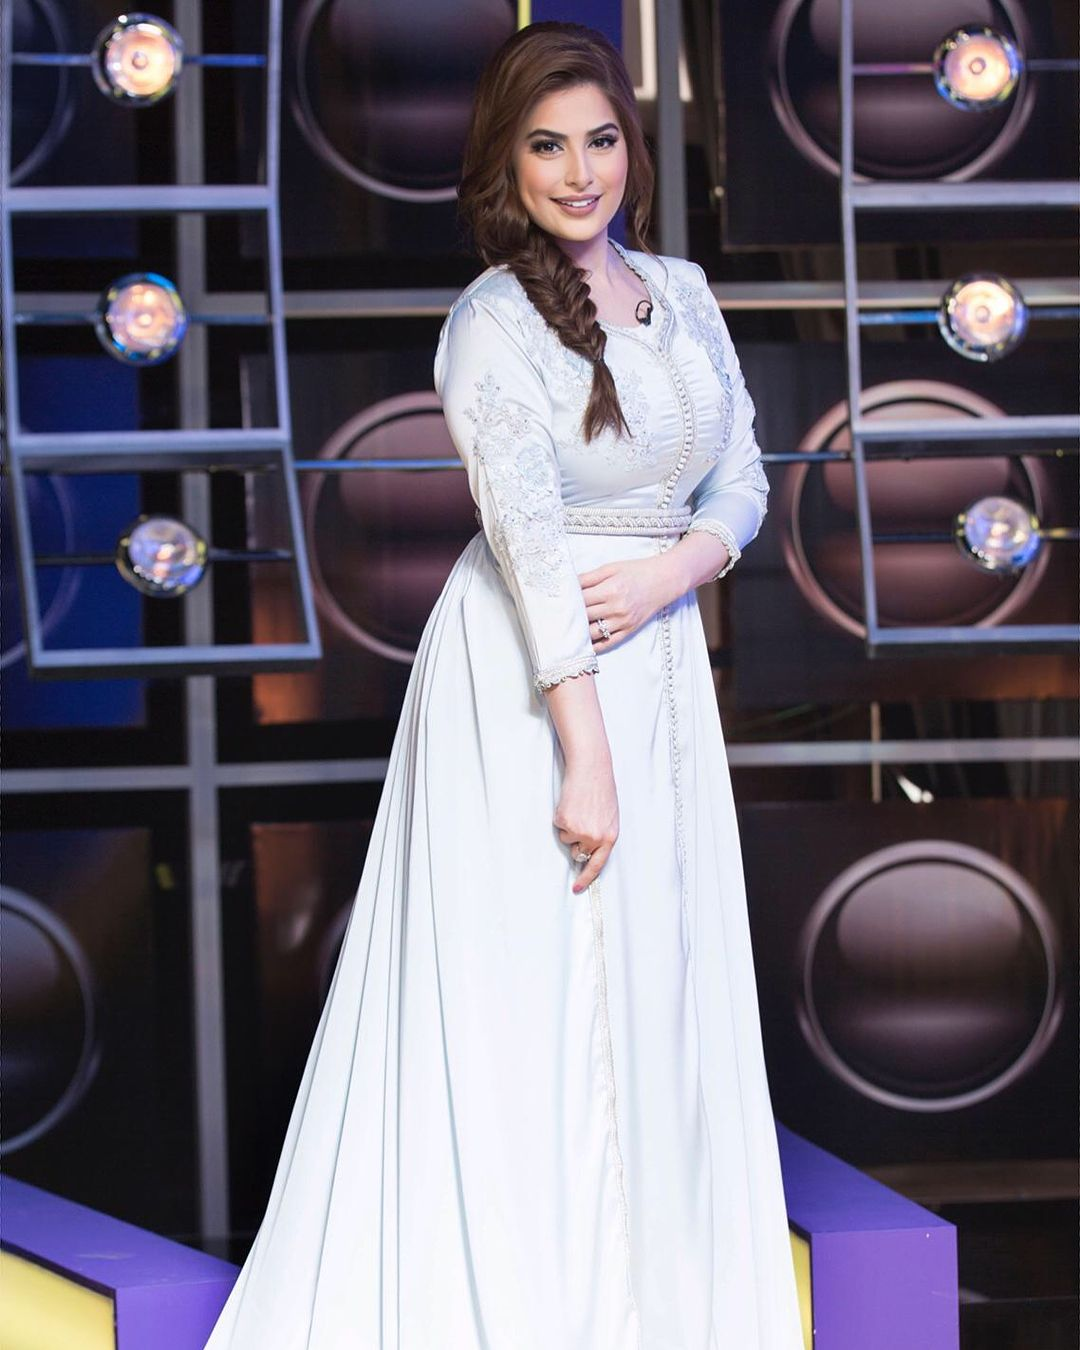 18 1 K Mentions J Aime 1 649 Commentaires Roaa رؤى الصبان Alsabban Roaa Alsabban Sur Instagram قفطان Almkamareyash Dresses Wedding Dresses Lace Style